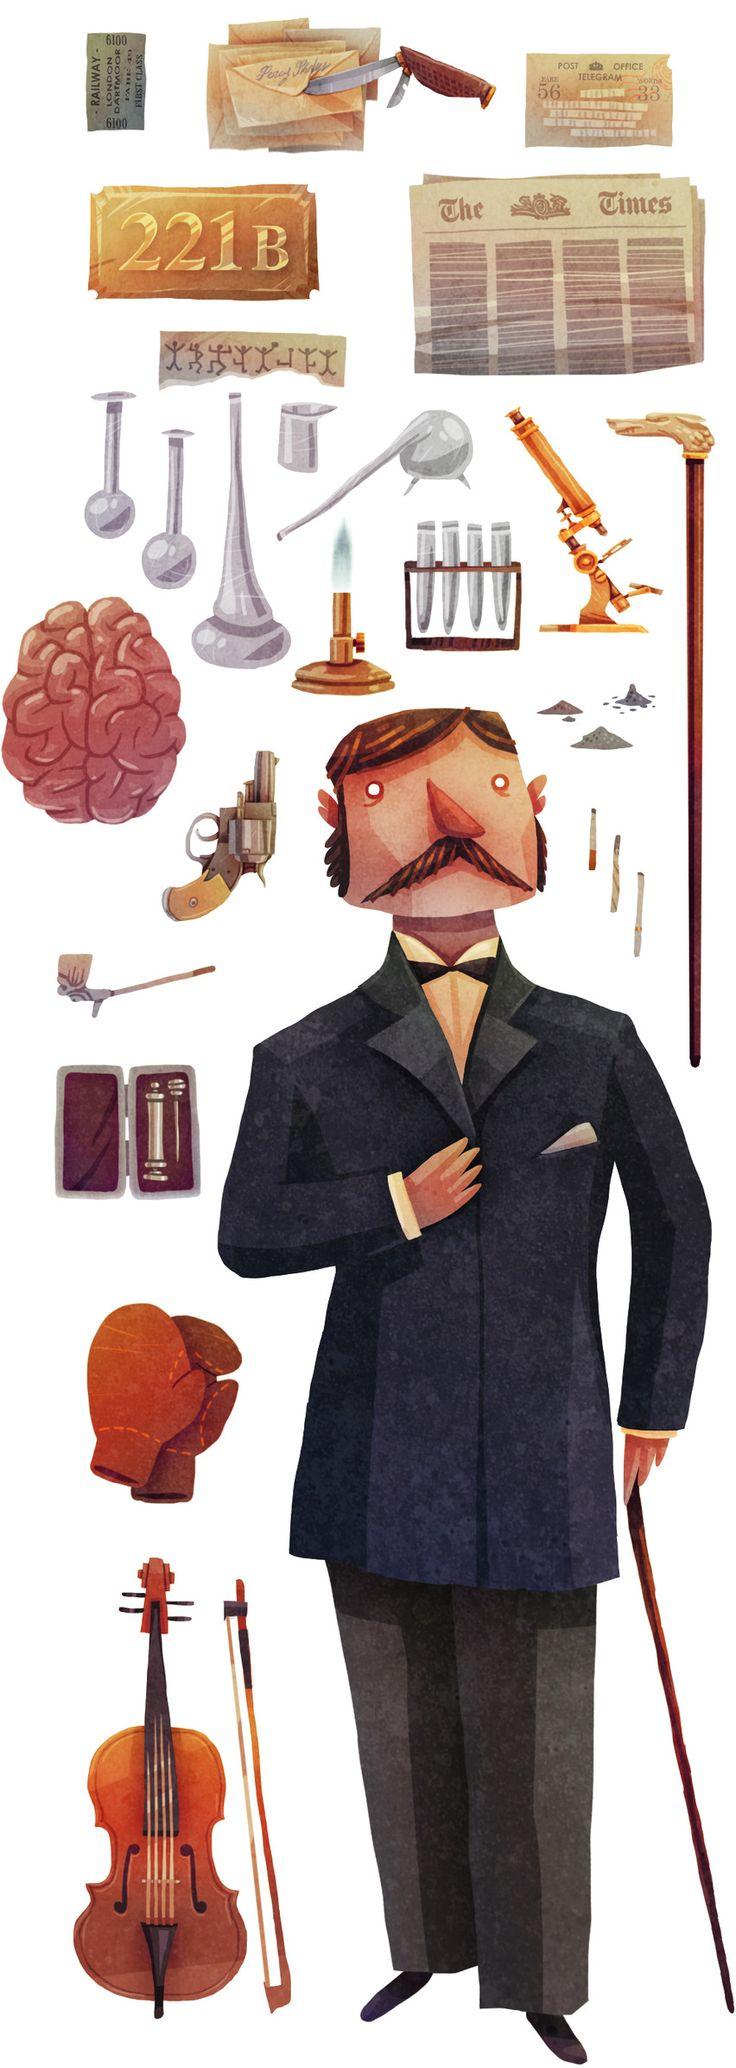 The Tools of a Consultant Detective - David Fernández Huerta